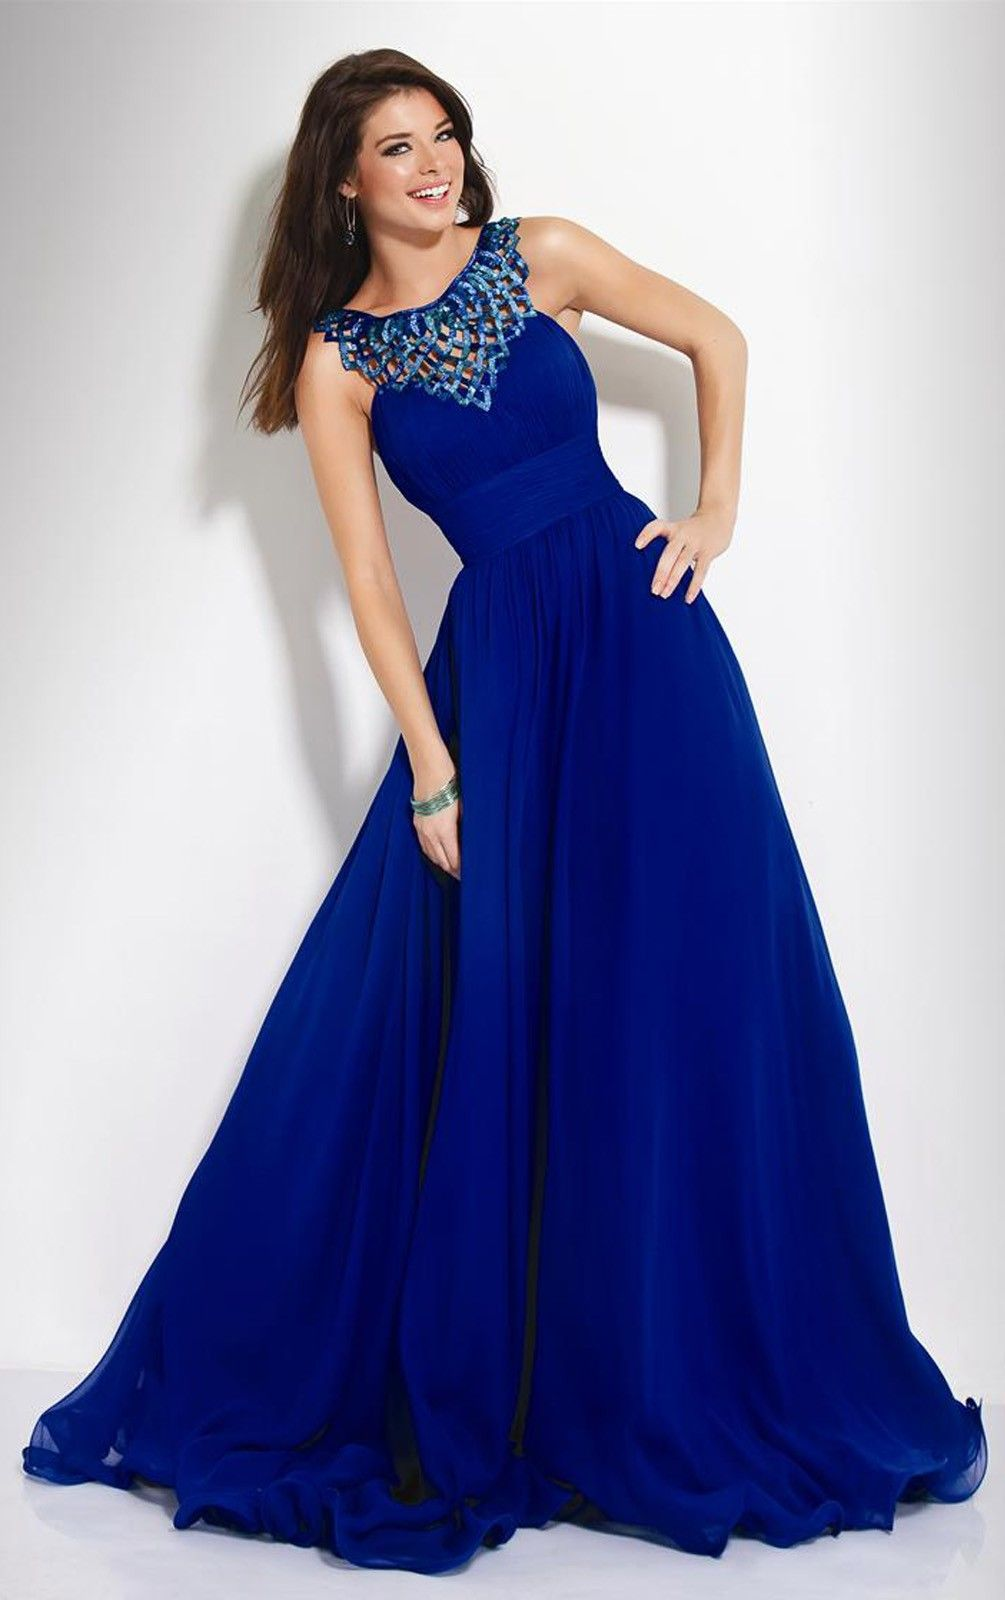 1915369ab Vestido azul de Chifon